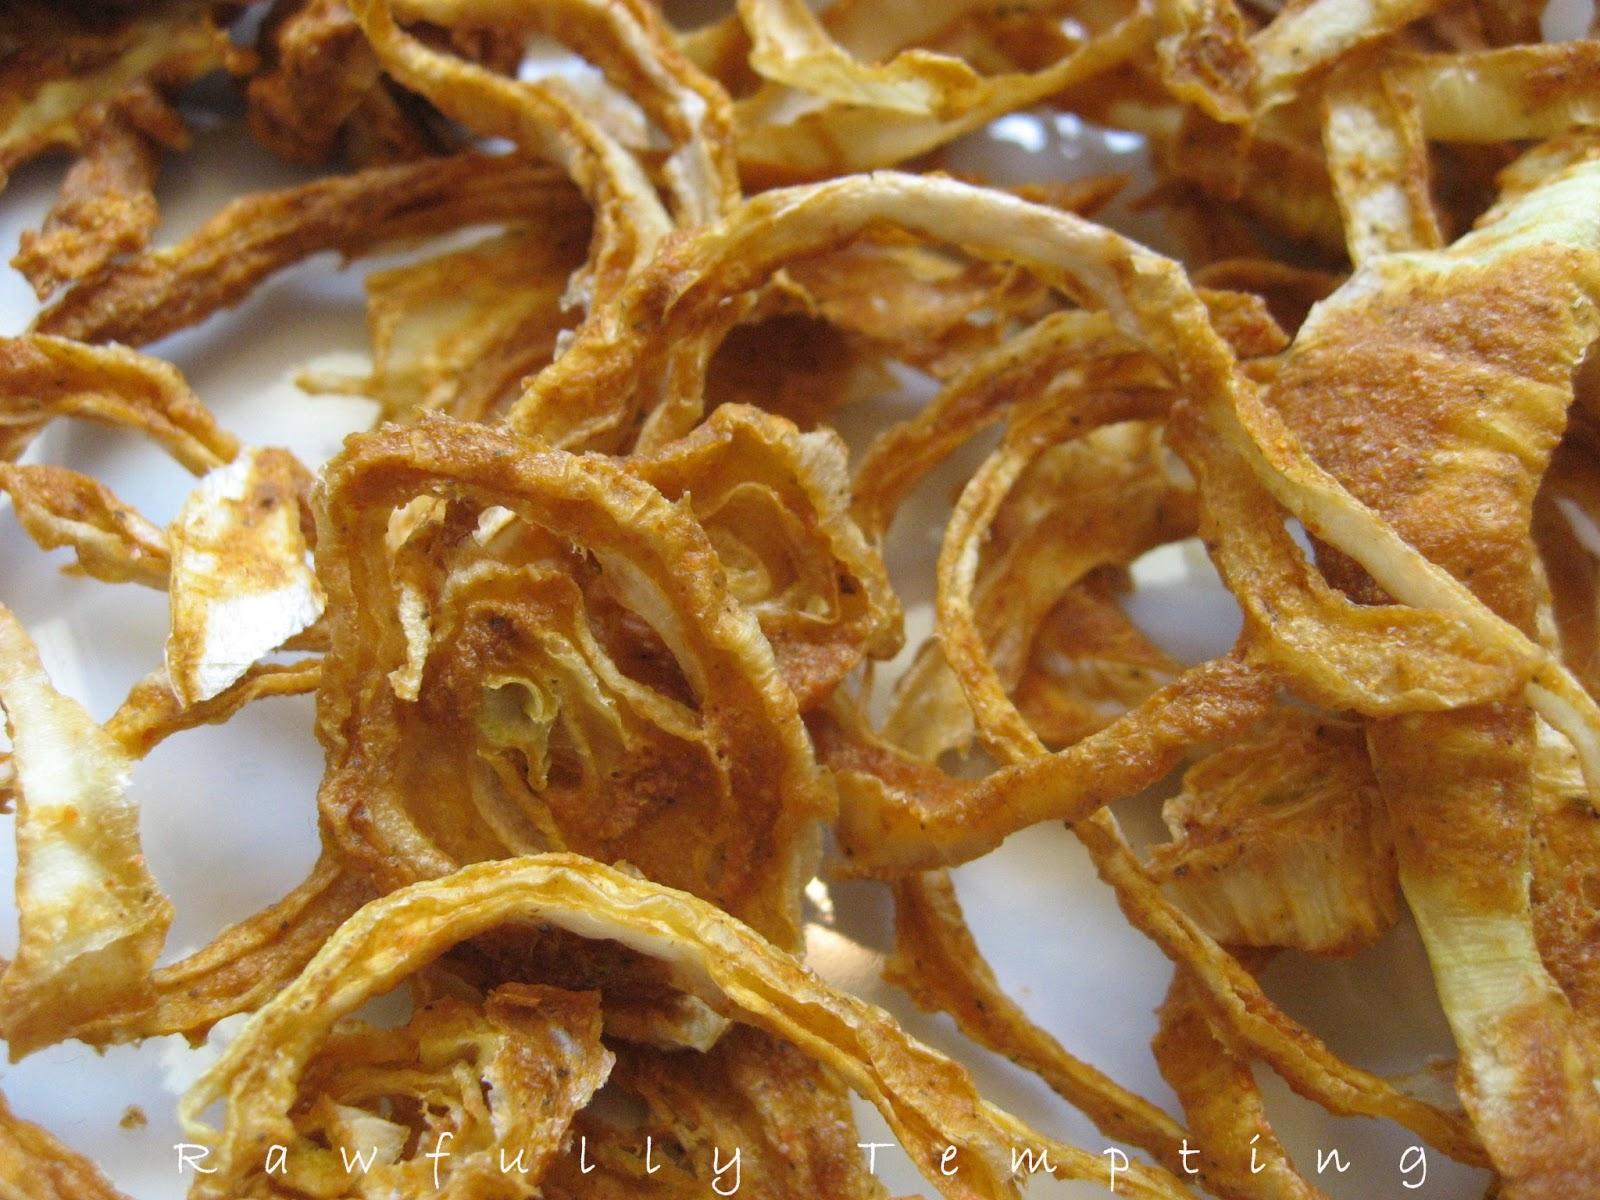 Heathly Onion Rings